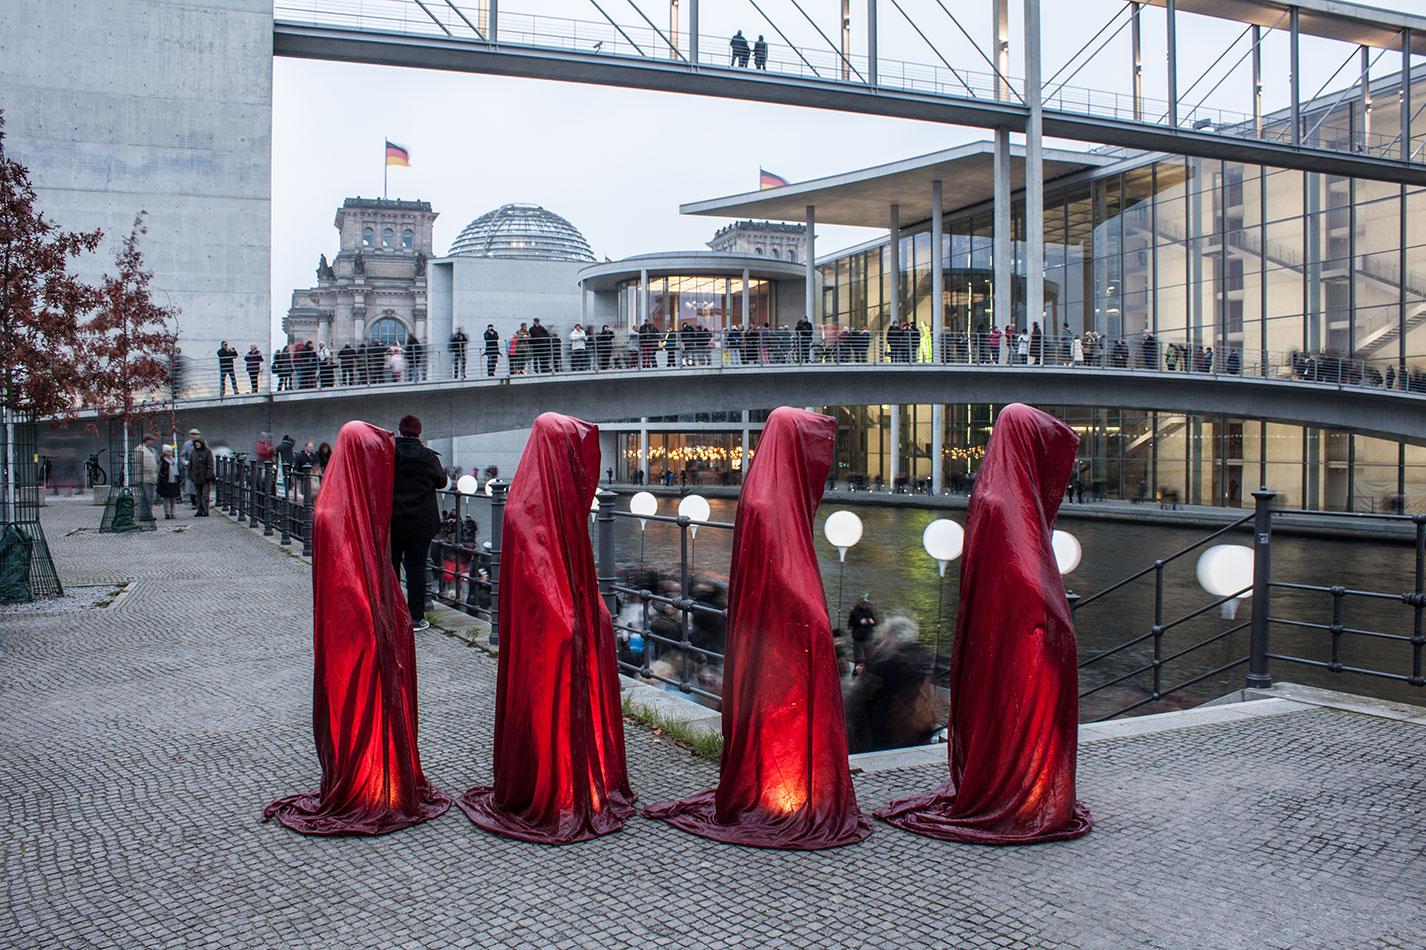 25-years-wallfall-berlin-germany-contemporary-fine-art-show-arts-design-sculpture-public-arts-arte-antique-guardians-of-time-manfred-kili-kielnhofer-4533